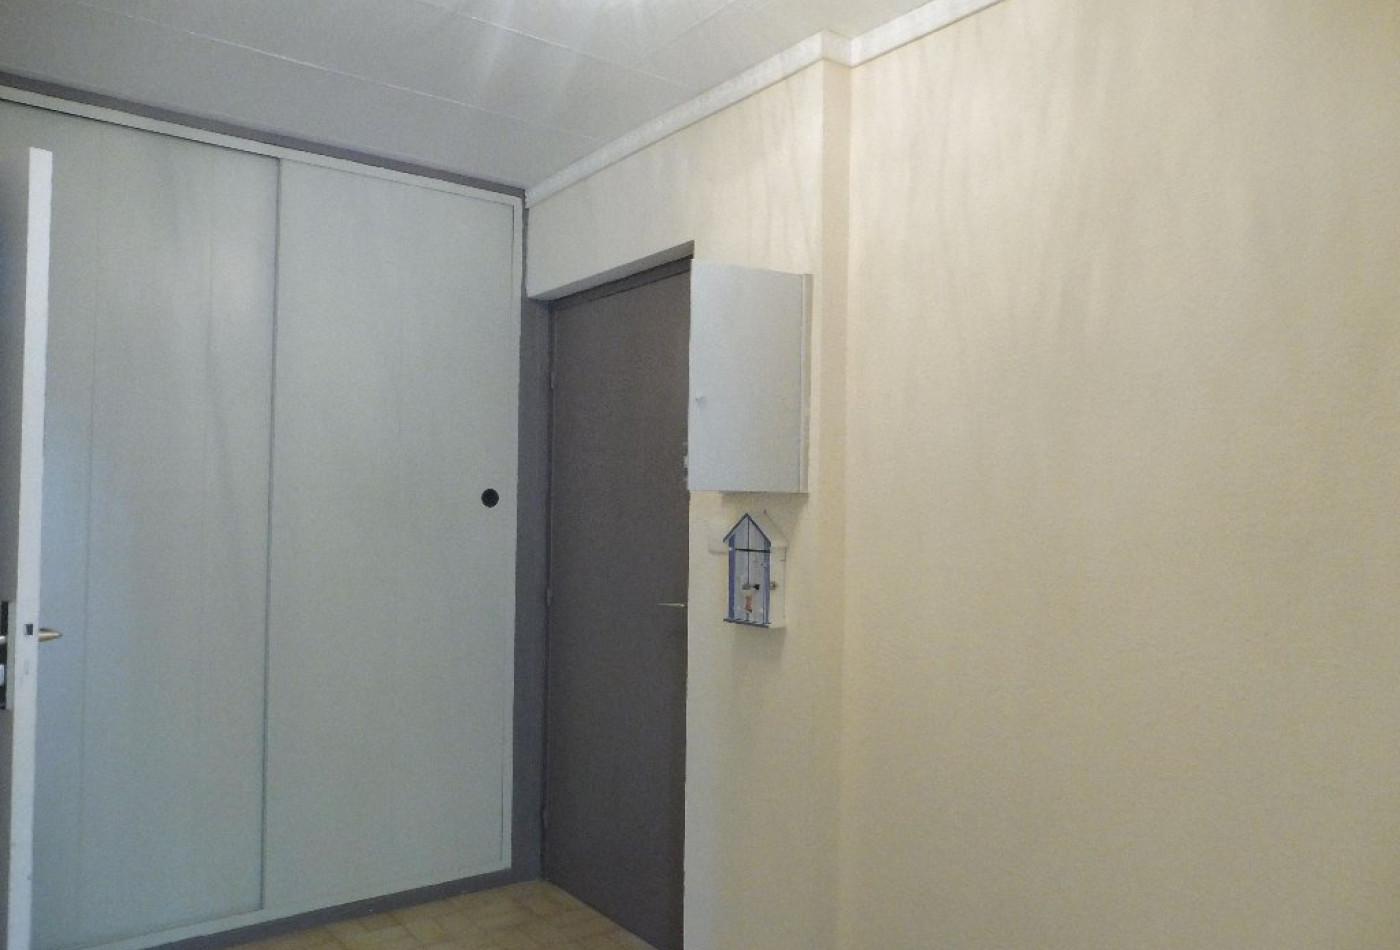 A vendre  Valras Plage   Réf 342042206 - Cabinet barthes